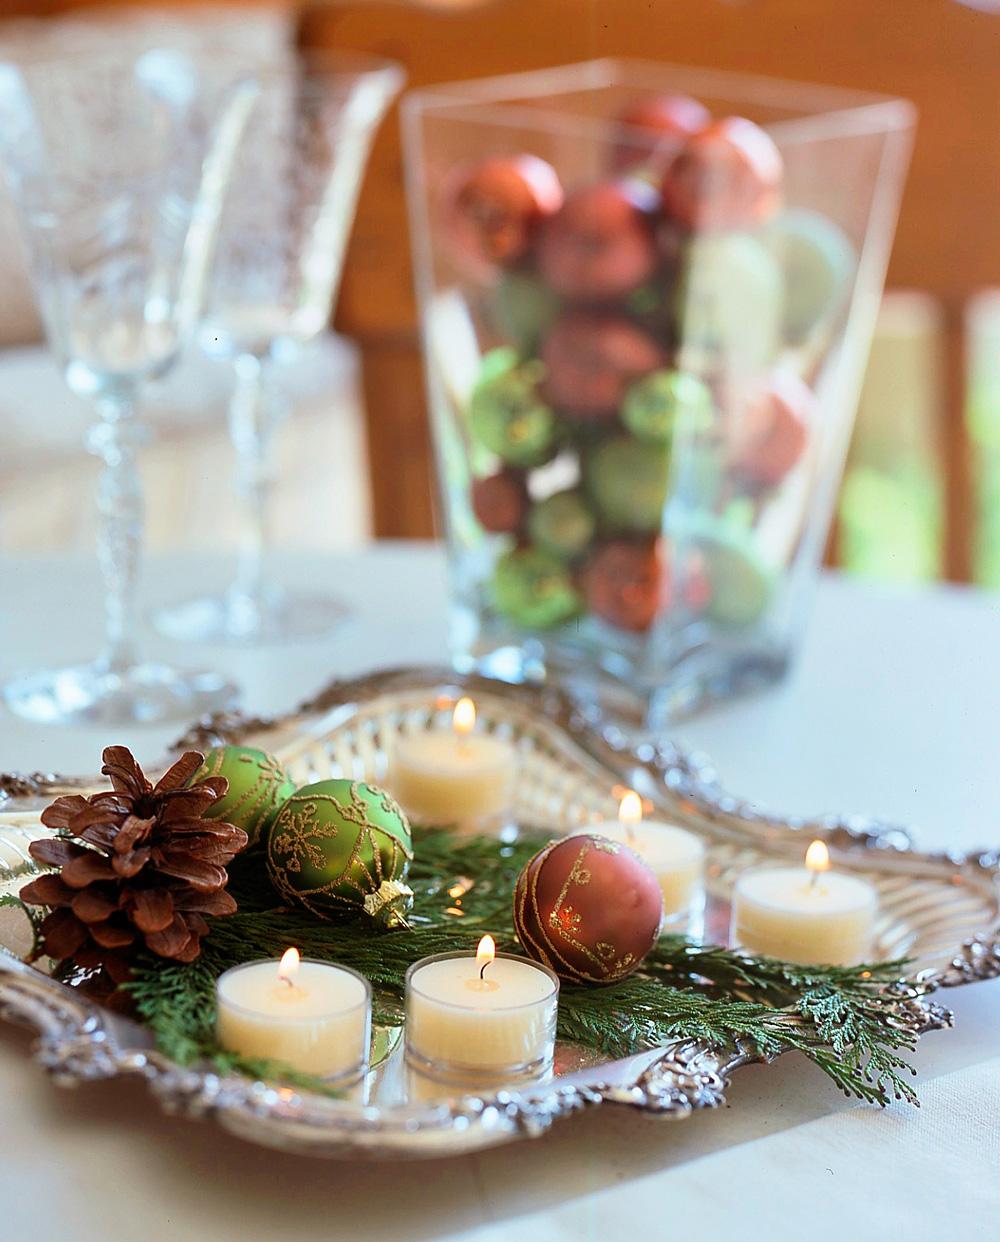 Christmas centerpiece ideas: ornaments on a tray